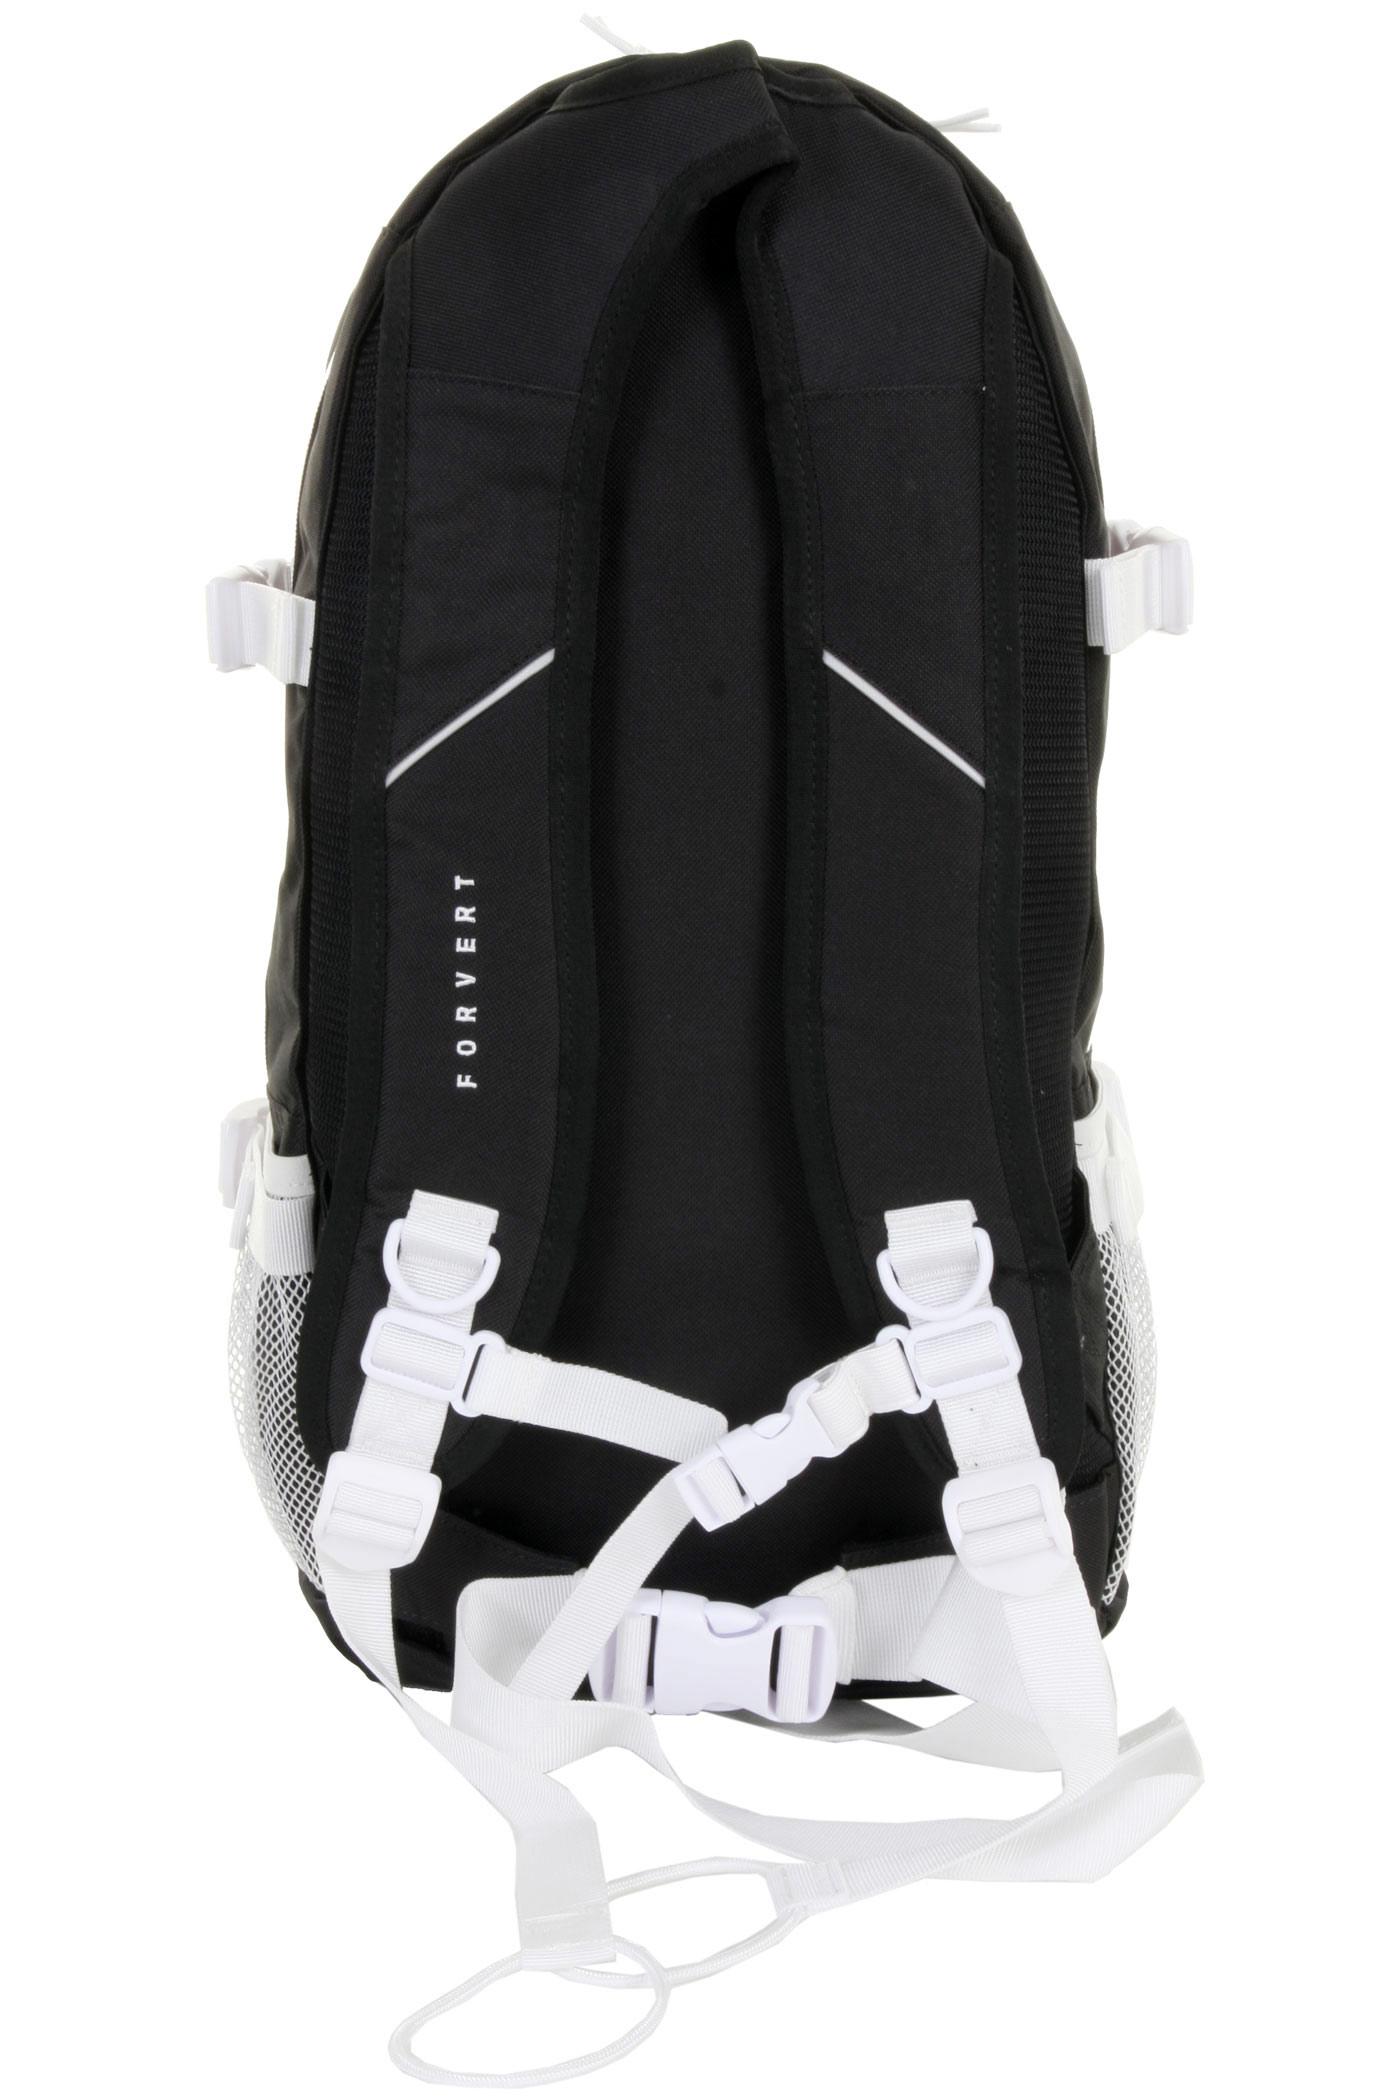 forvert ice louis backpack 20l black achetez sur skatedeluxe. Black Bedroom Furniture Sets. Home Design Ideas